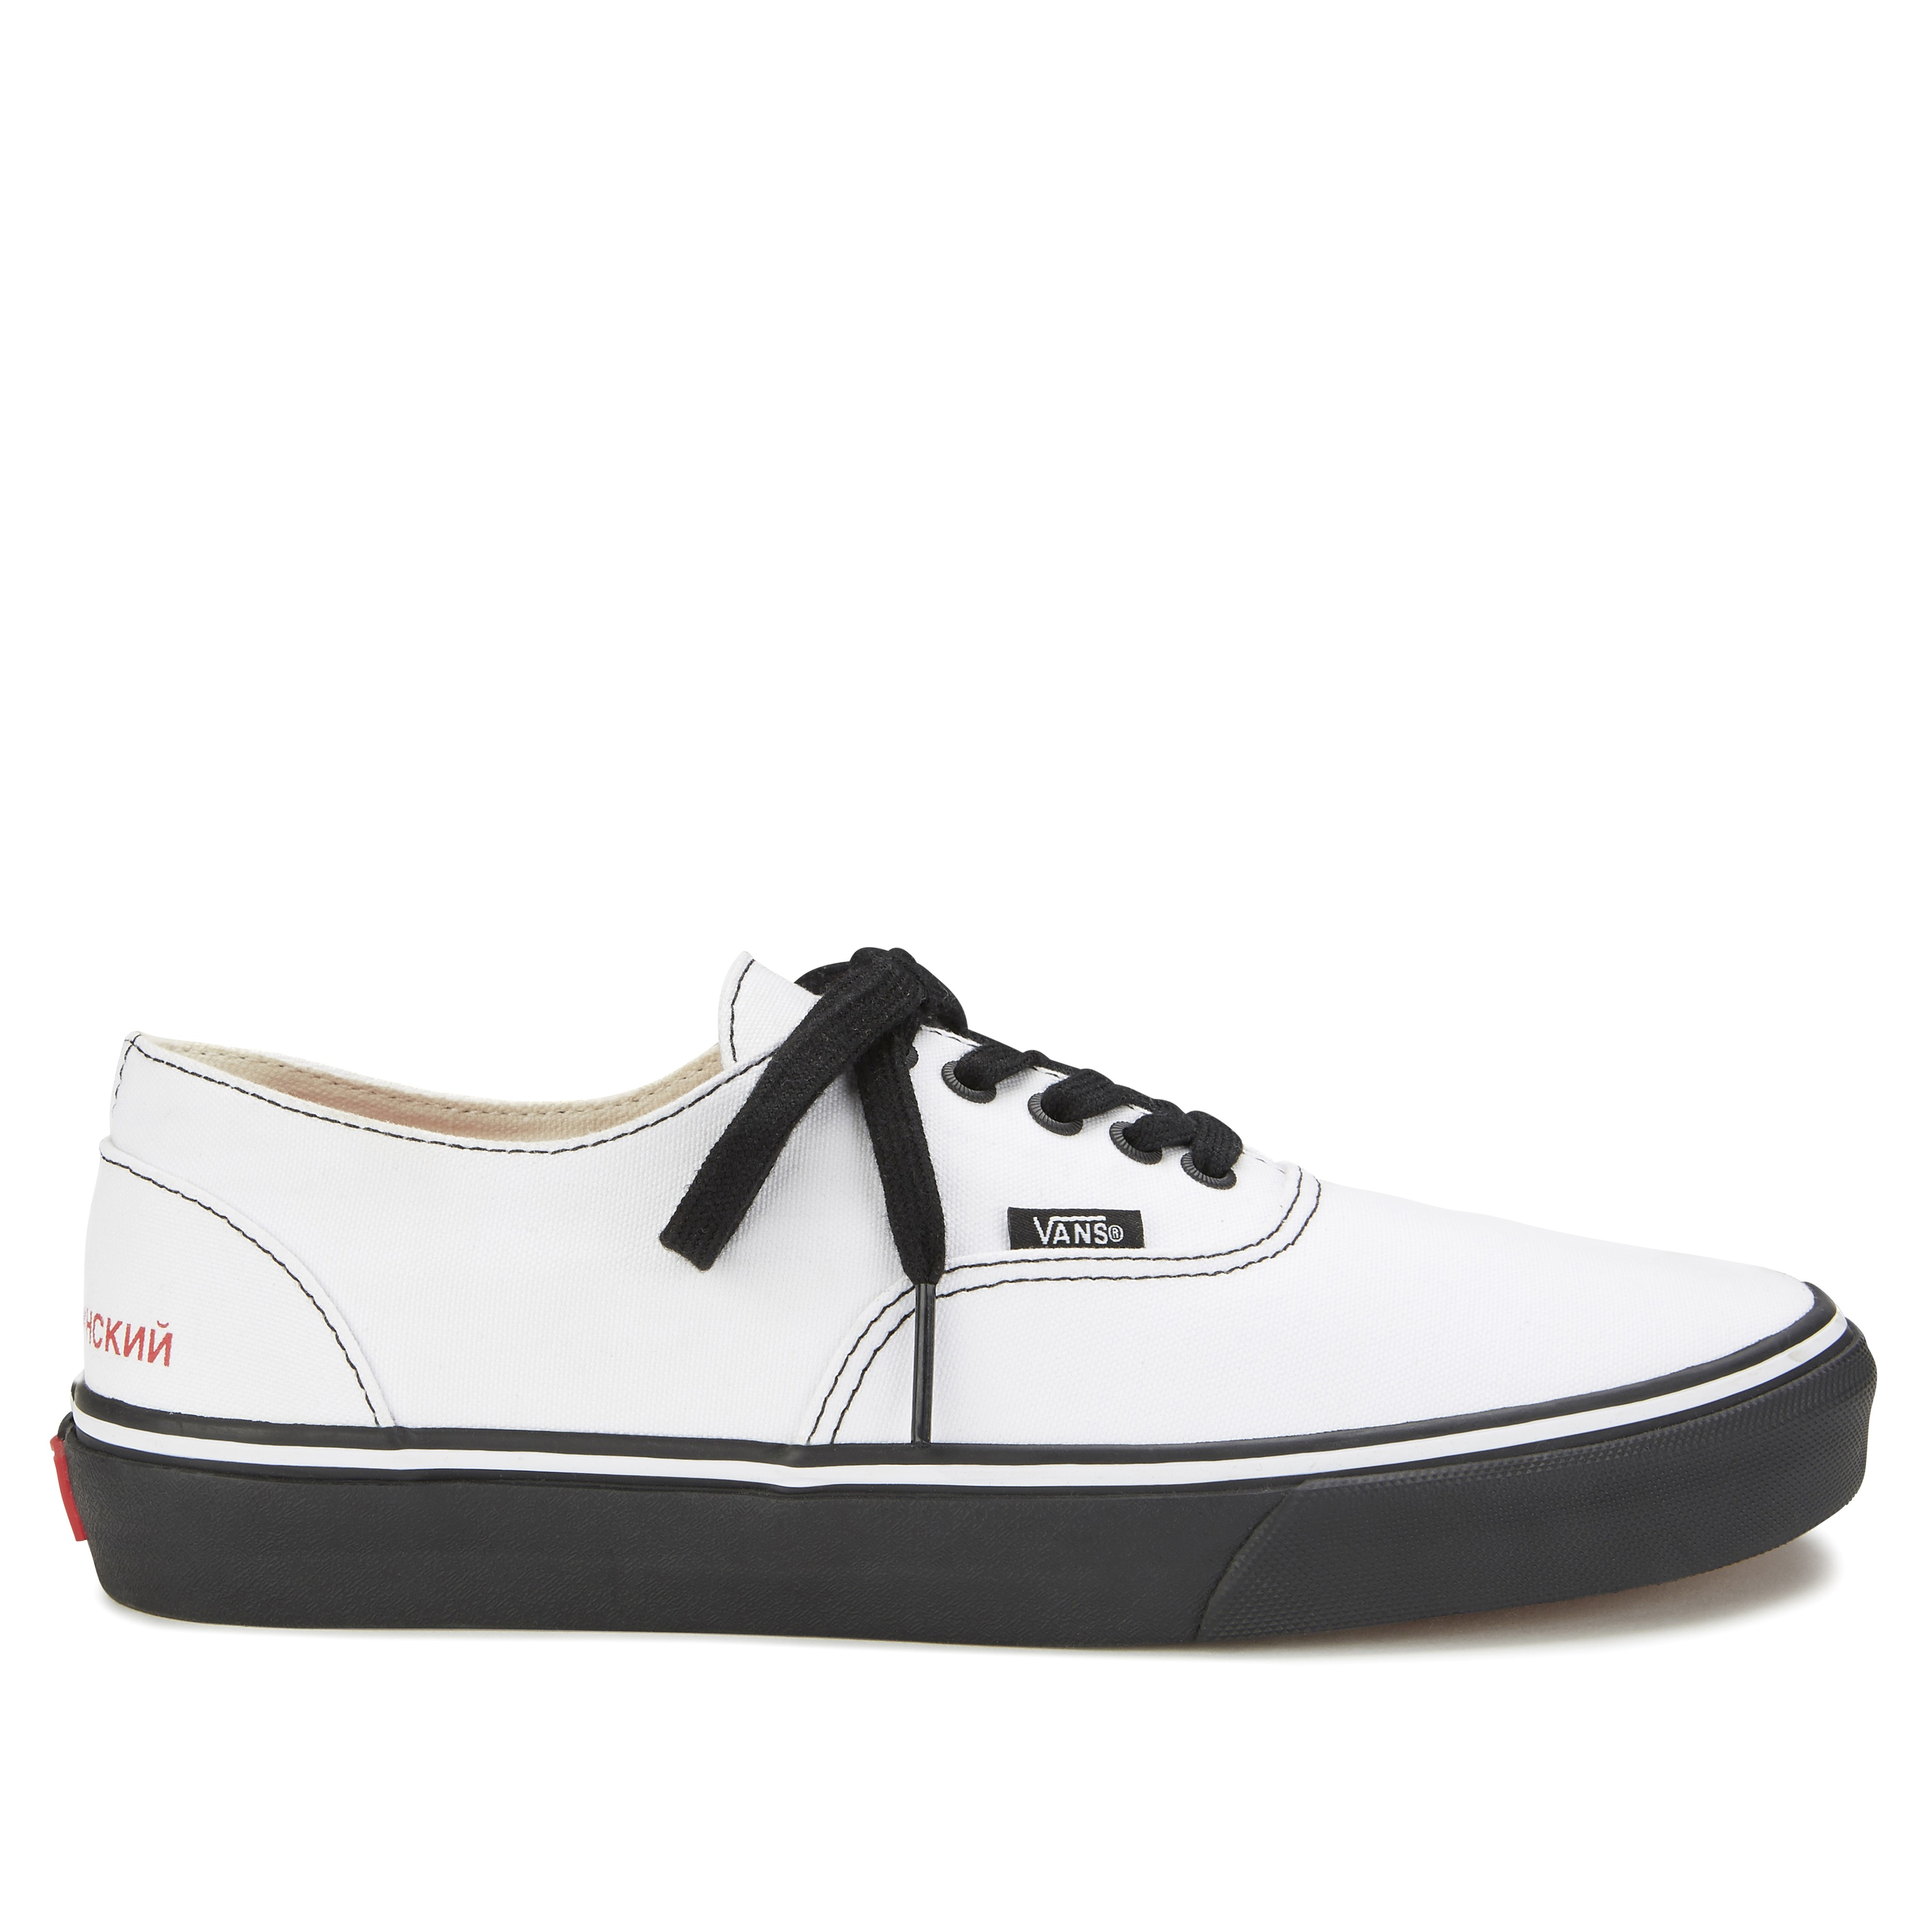 Sponsors 7 >> Very Goods | Gosha Rubchinskiy X Vans Cotton Canvas Shoes (VN0A2VIEJJA)